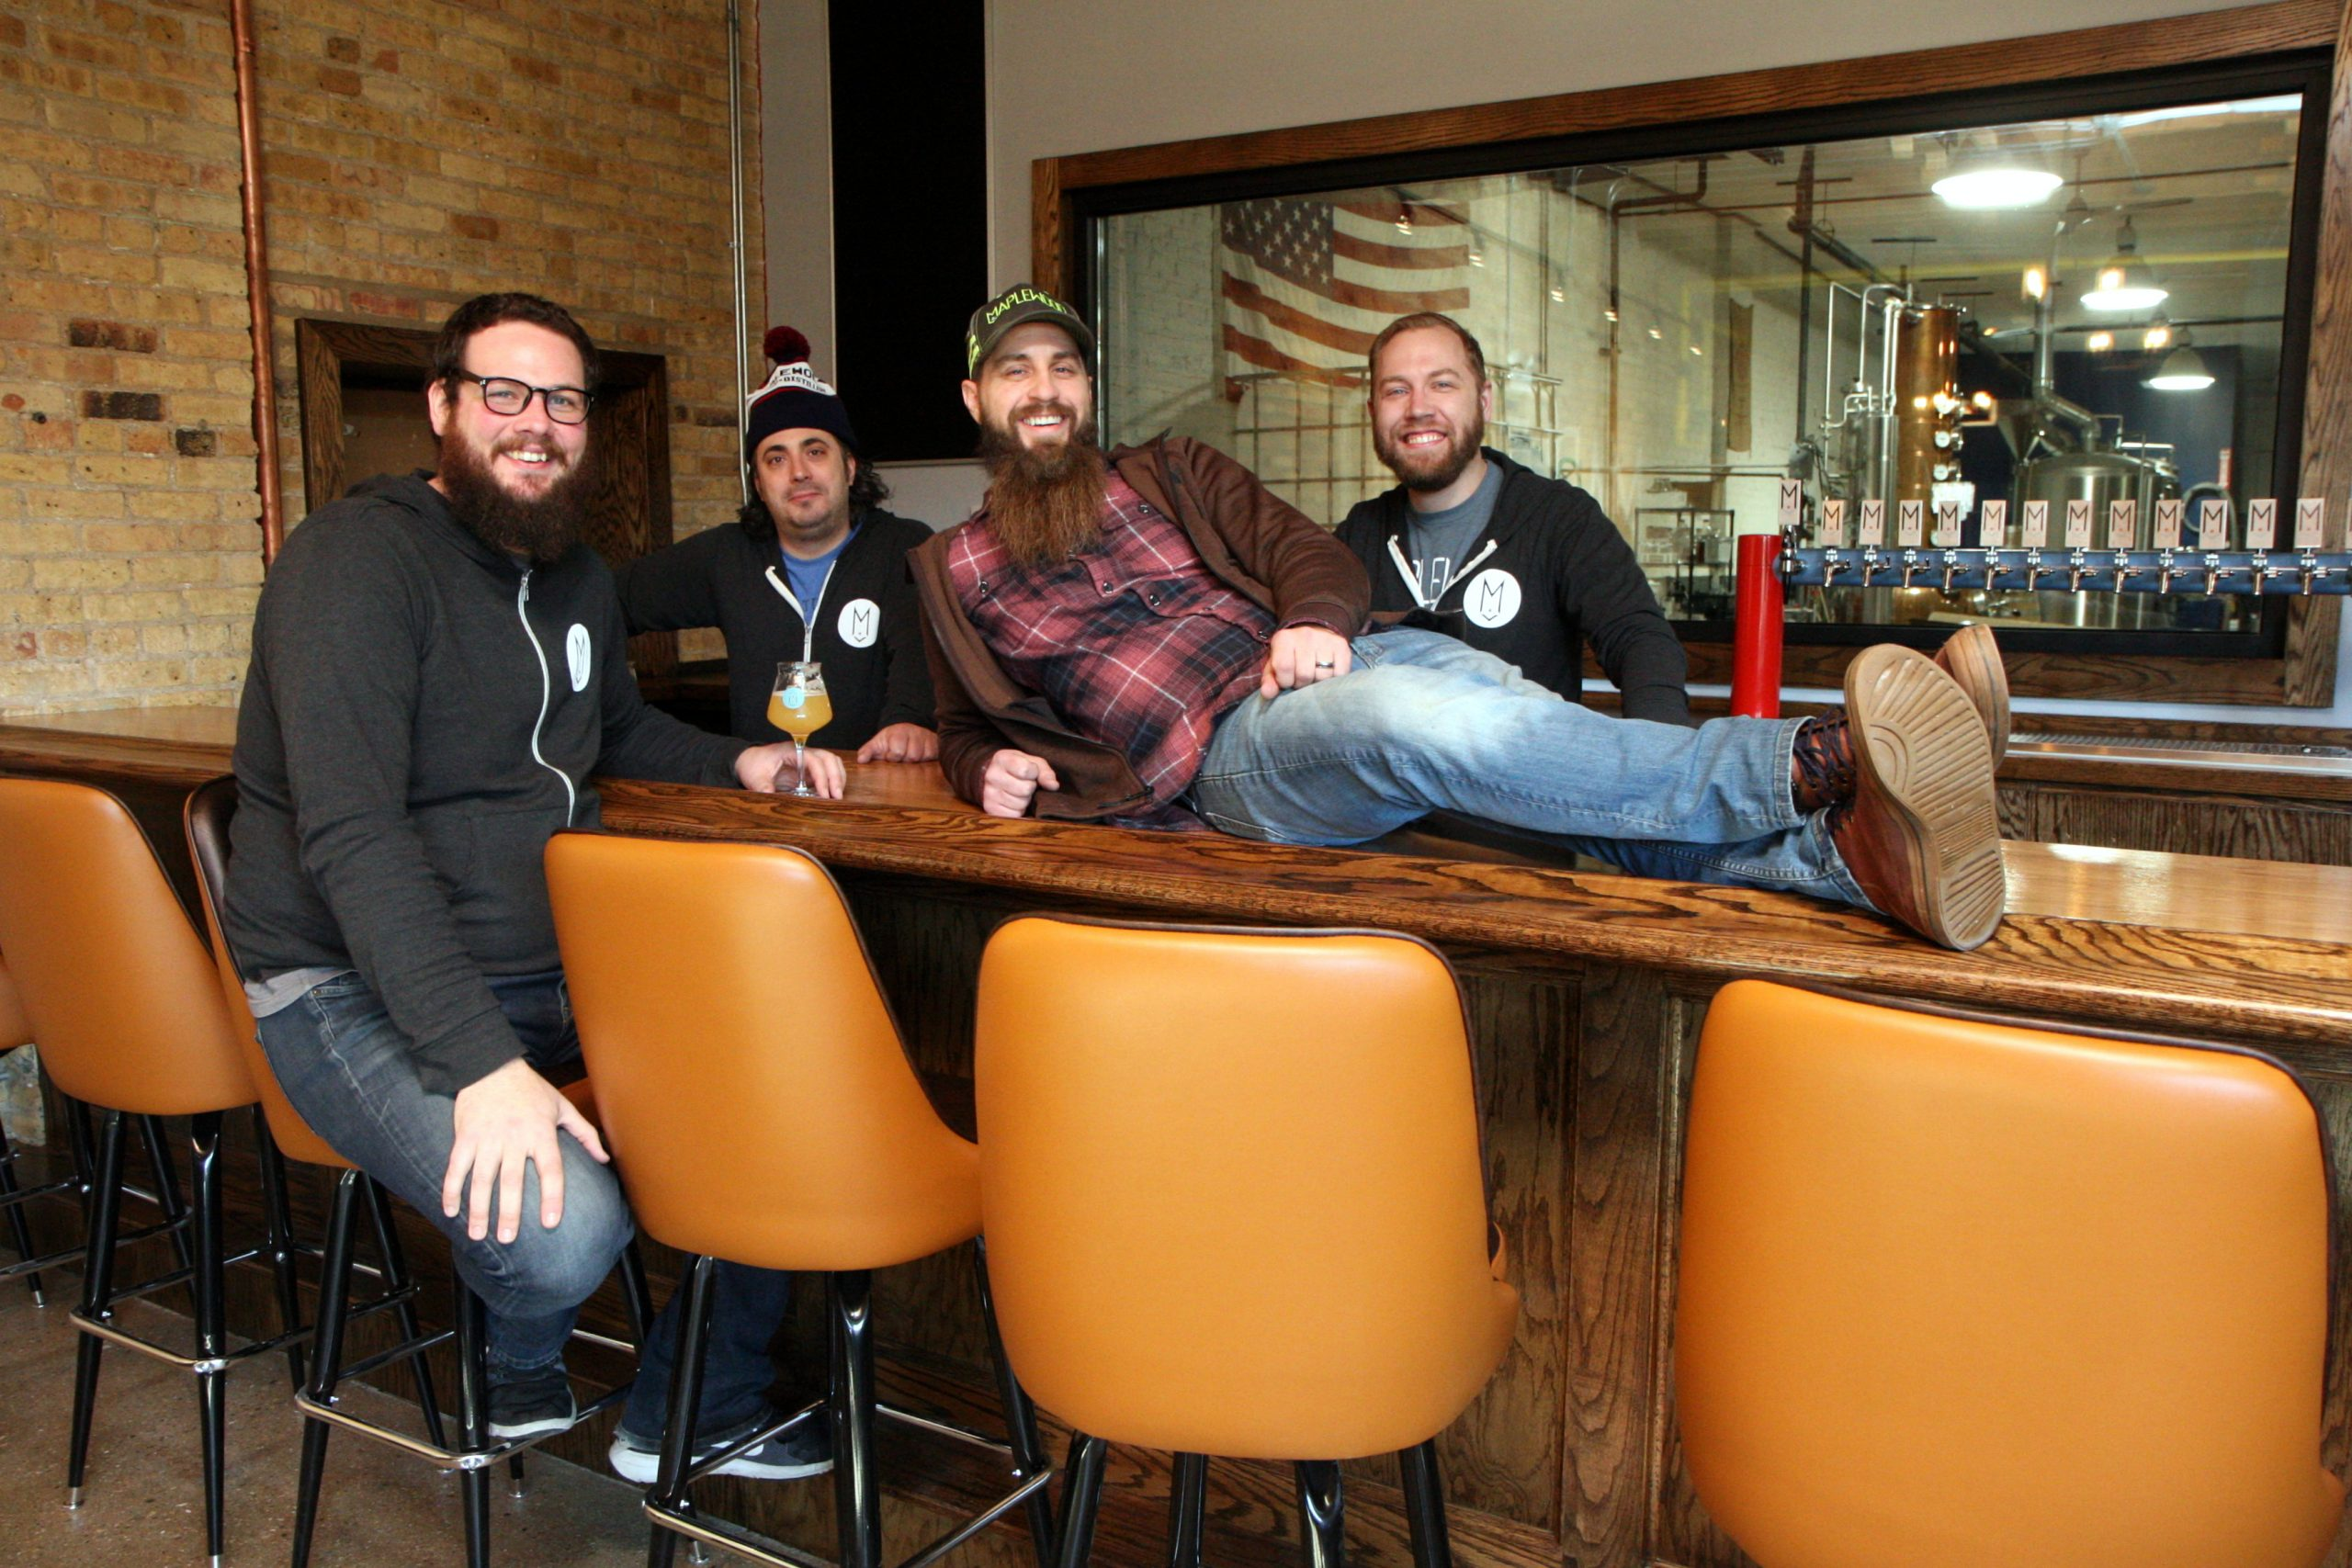 From left: Adam Smith, Ari Megalis, Adam Cieslak, and Matt Frederick